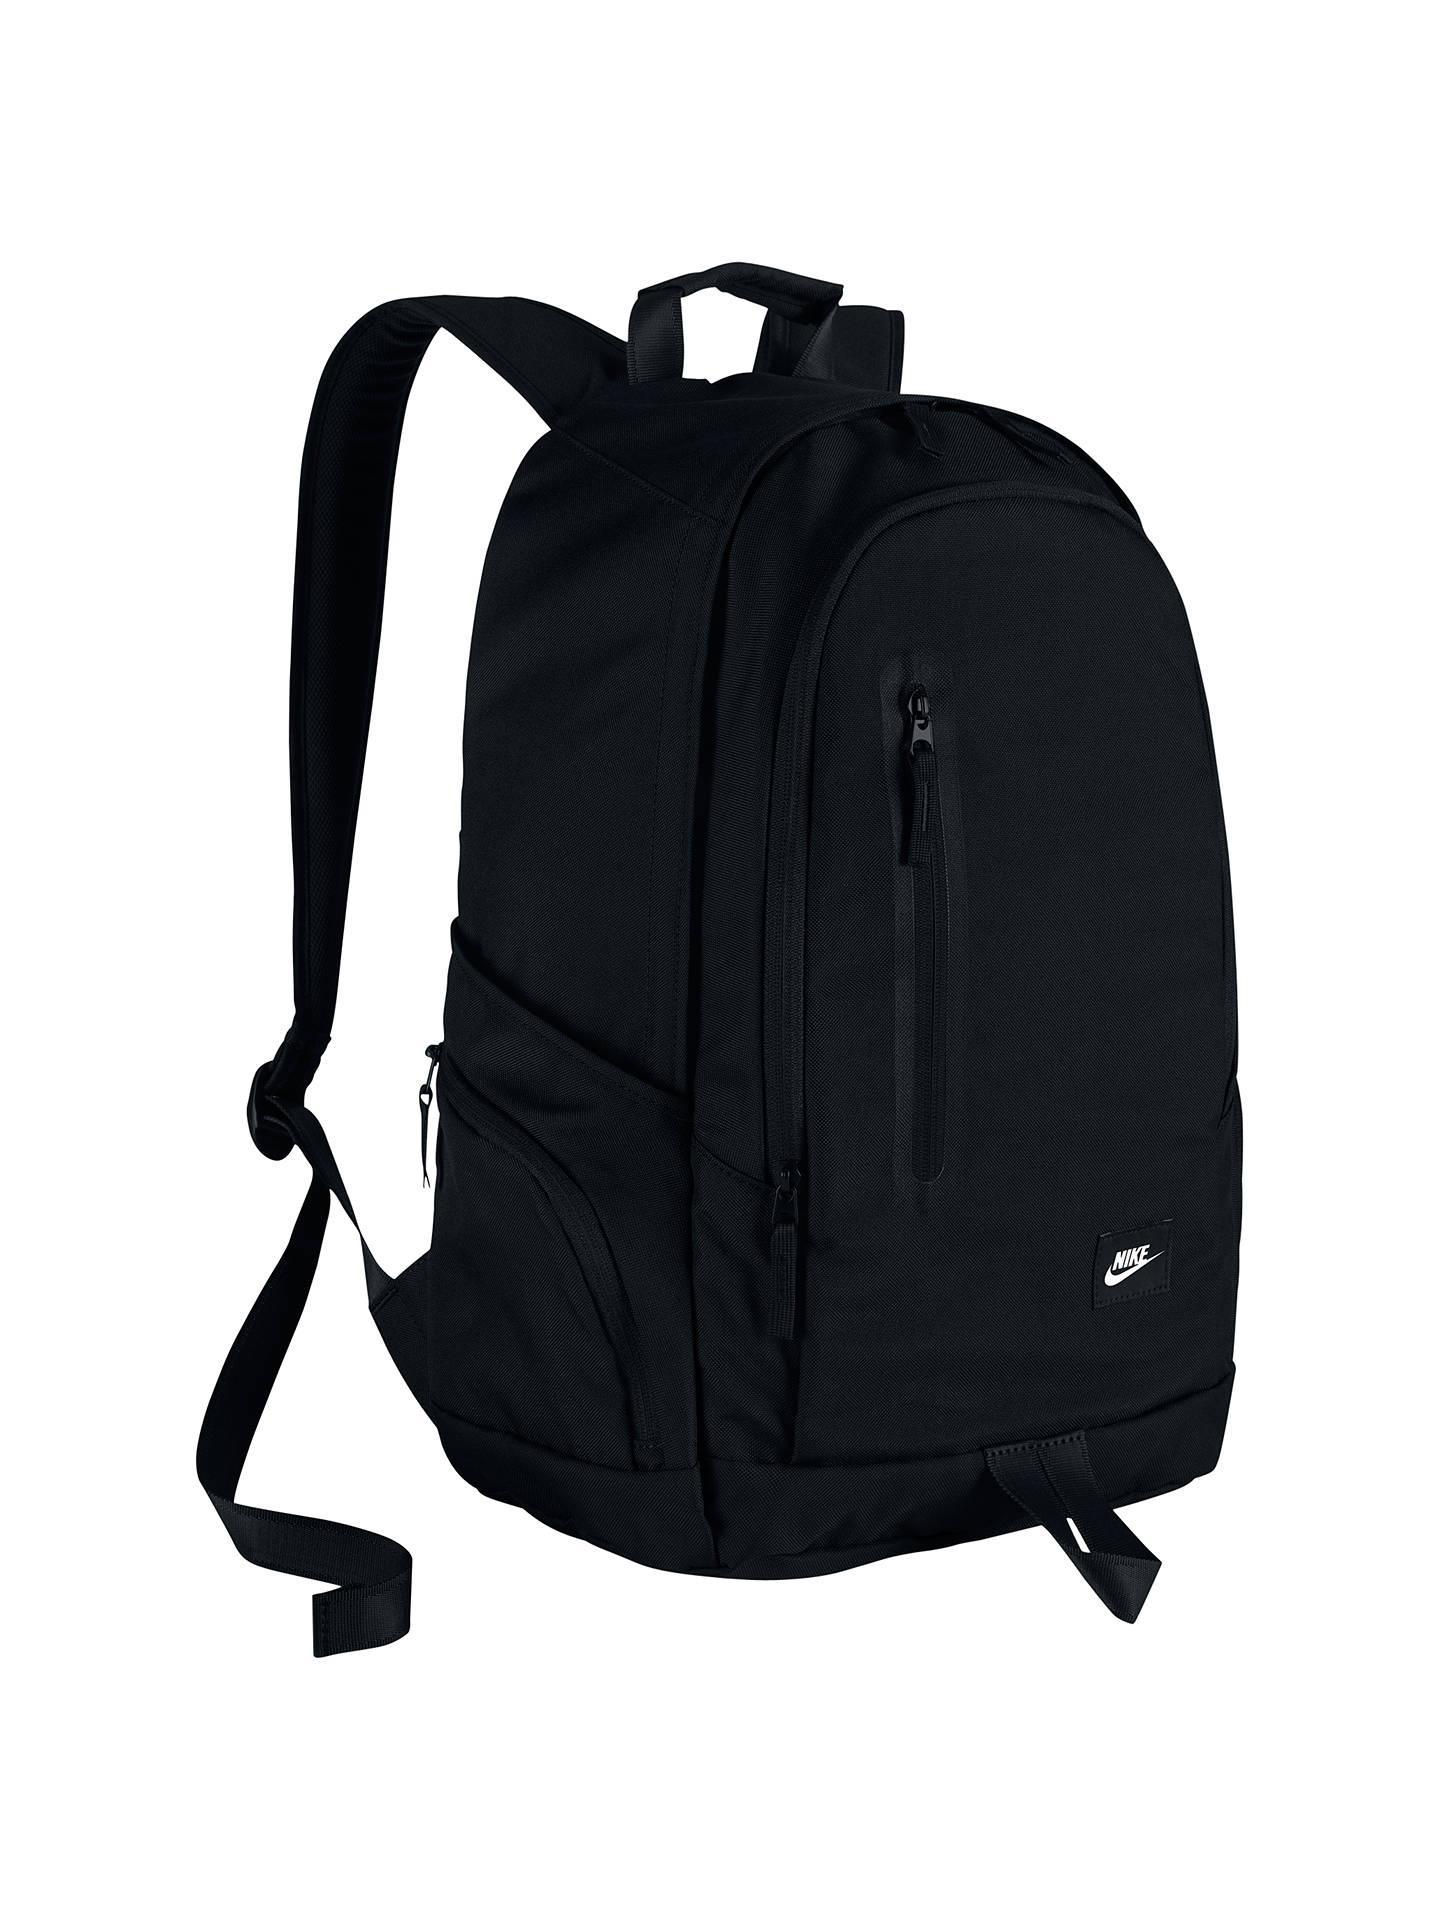 a1e3f1a46341 Nike All Access Fullfare Backpack at John Lewis   Partners